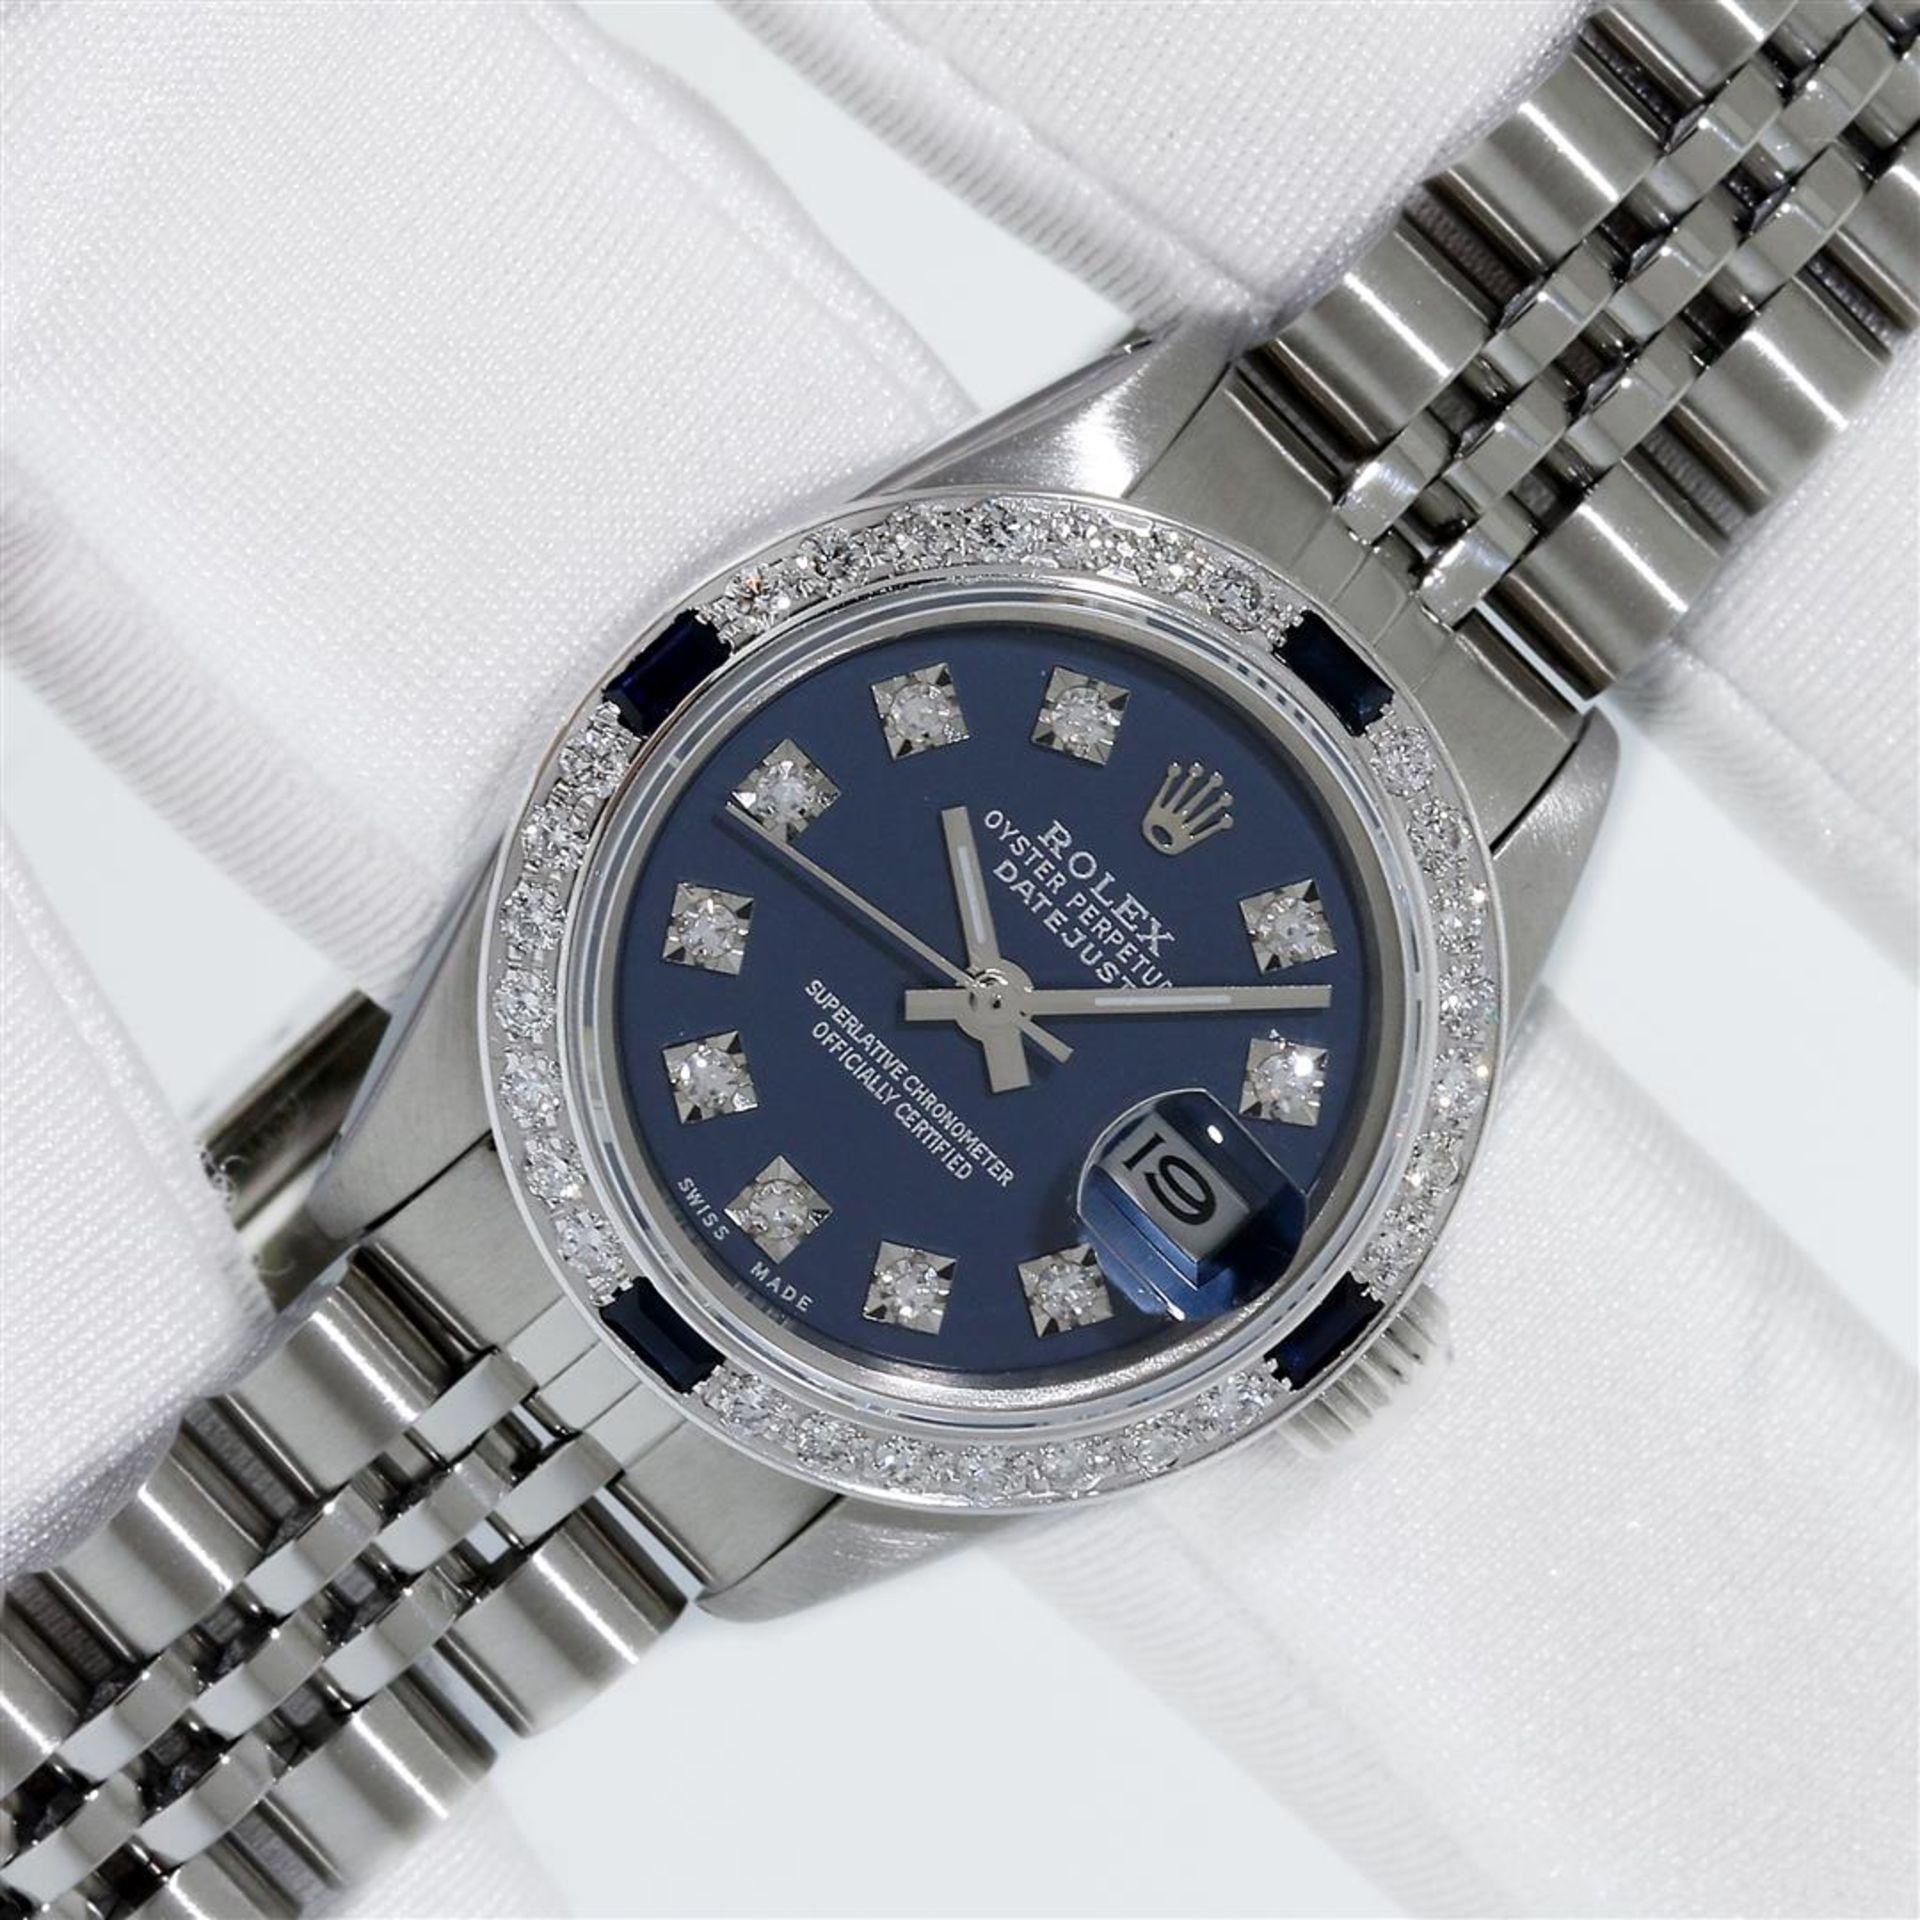 Rolex Ladies Stainless Steel Blue VVS Diamond & Sapphire Datejust Wristwatch - Image 2 of 9